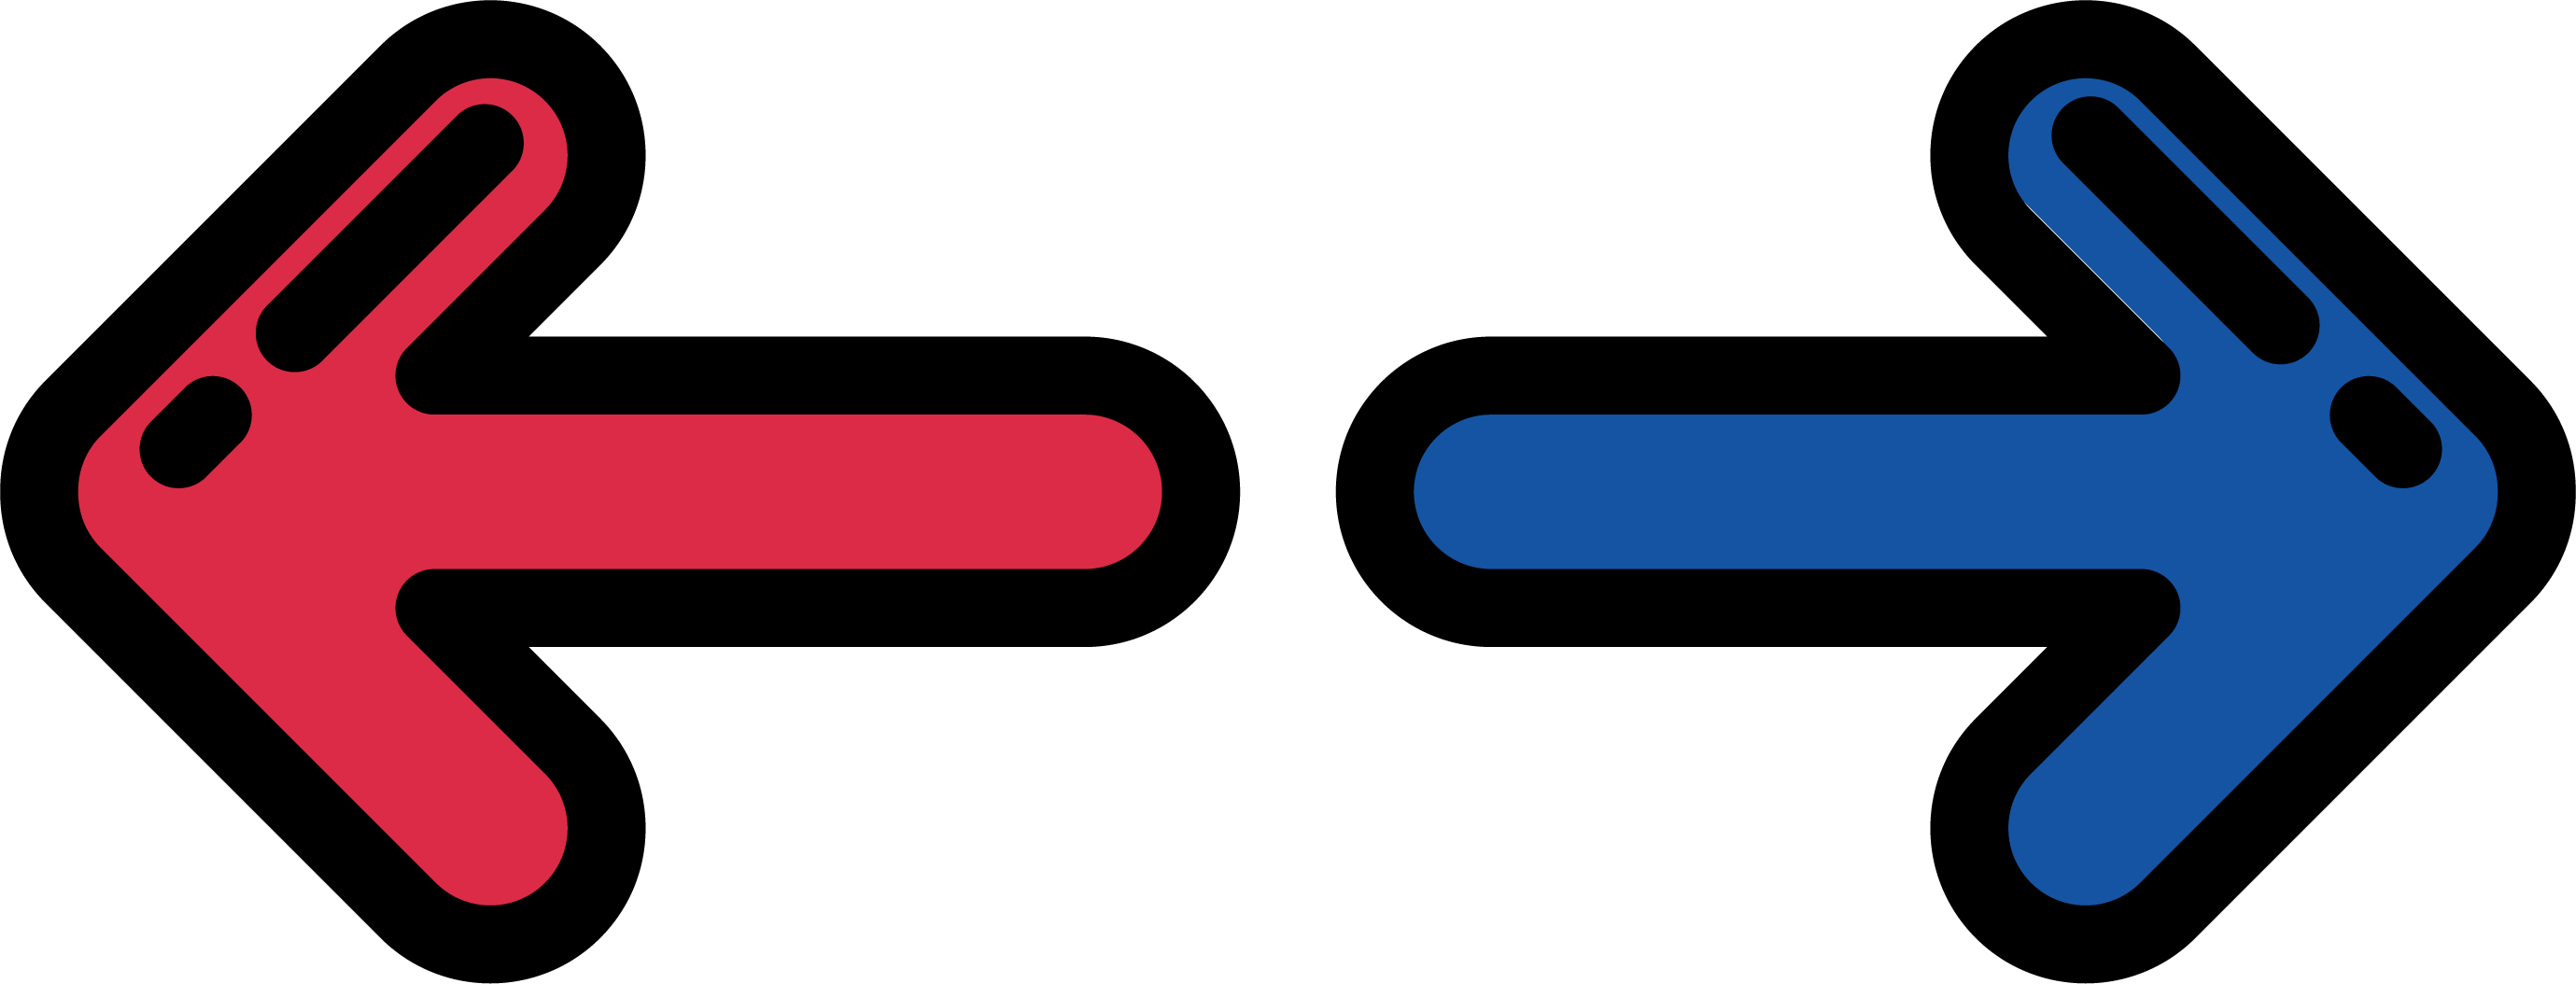 Integration arrows